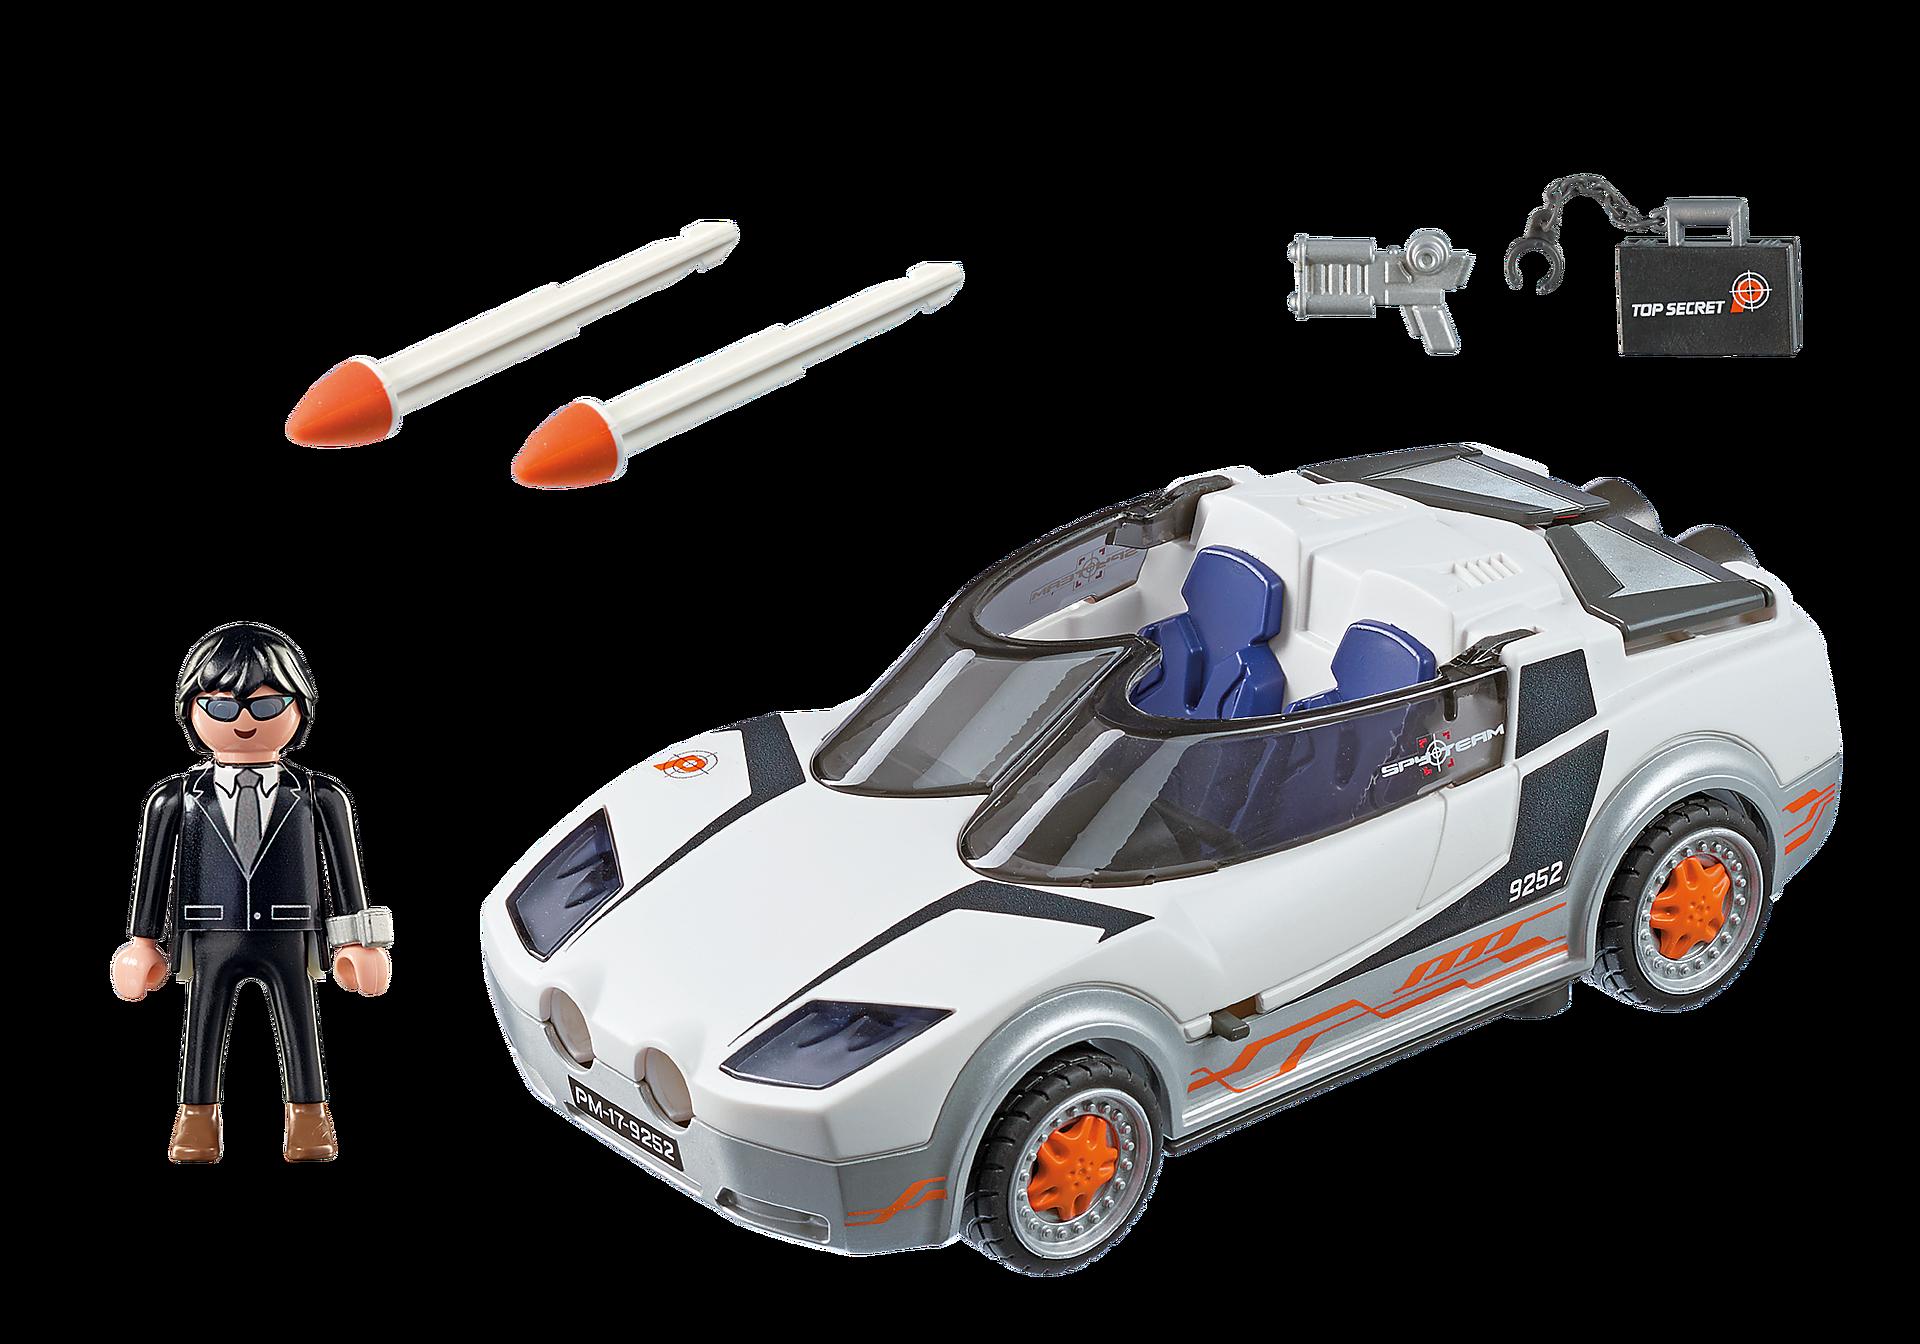 http://media.playmobil.com/i/playmobil/9252_product_box_back/Agent P. i racer